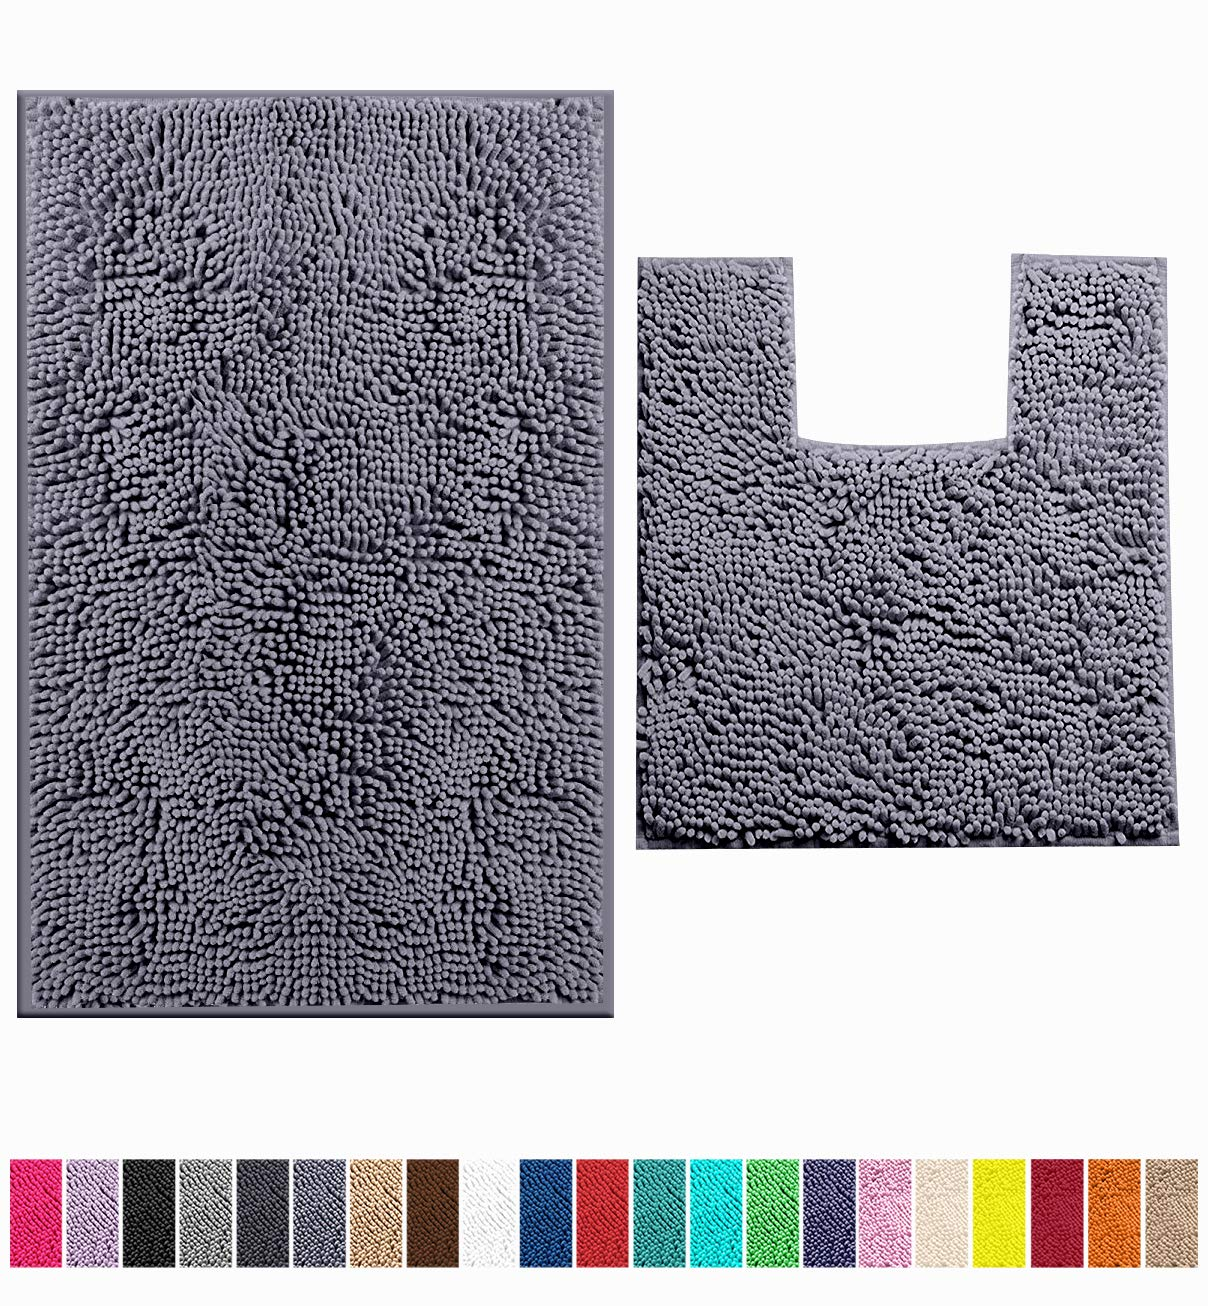 LuxUrux Bathroom Rugs Luxury Chenille 2-Piece Bath Mat Set, Soft Plush Anti-Slip Bath Rug +Toilet Mat.1'' Microfiber Shaggy Carpet, Super Absorbent Machine Washable Mats (Curved Set Medium, Dark Gray)